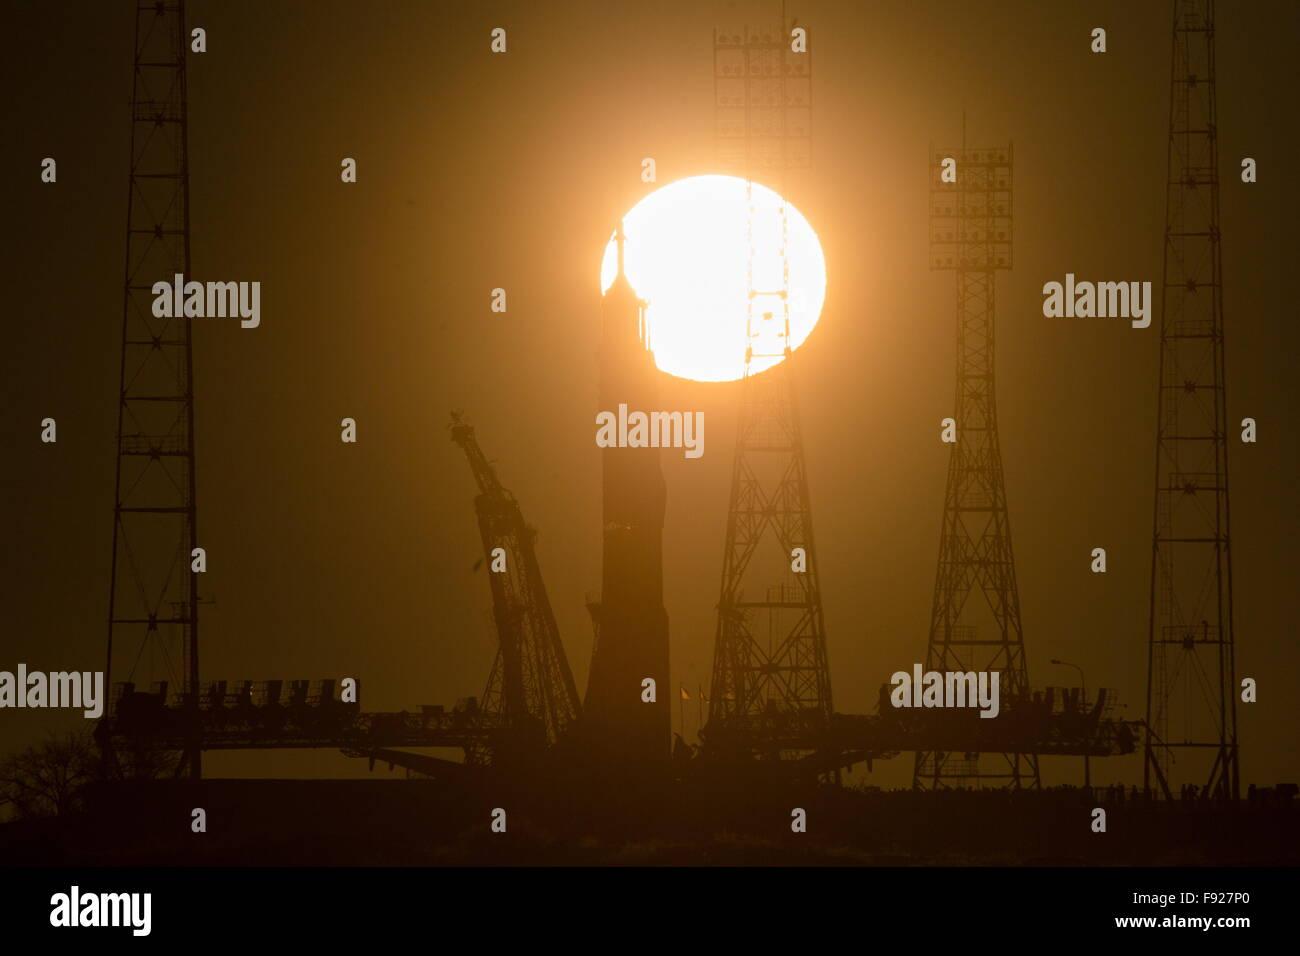 Baikonur, Kazakhstan. 13th Dec, 2015. A Soyuz FG rocket booster with the Soyuz TMA-19M spacecraft being installed - Stock Image